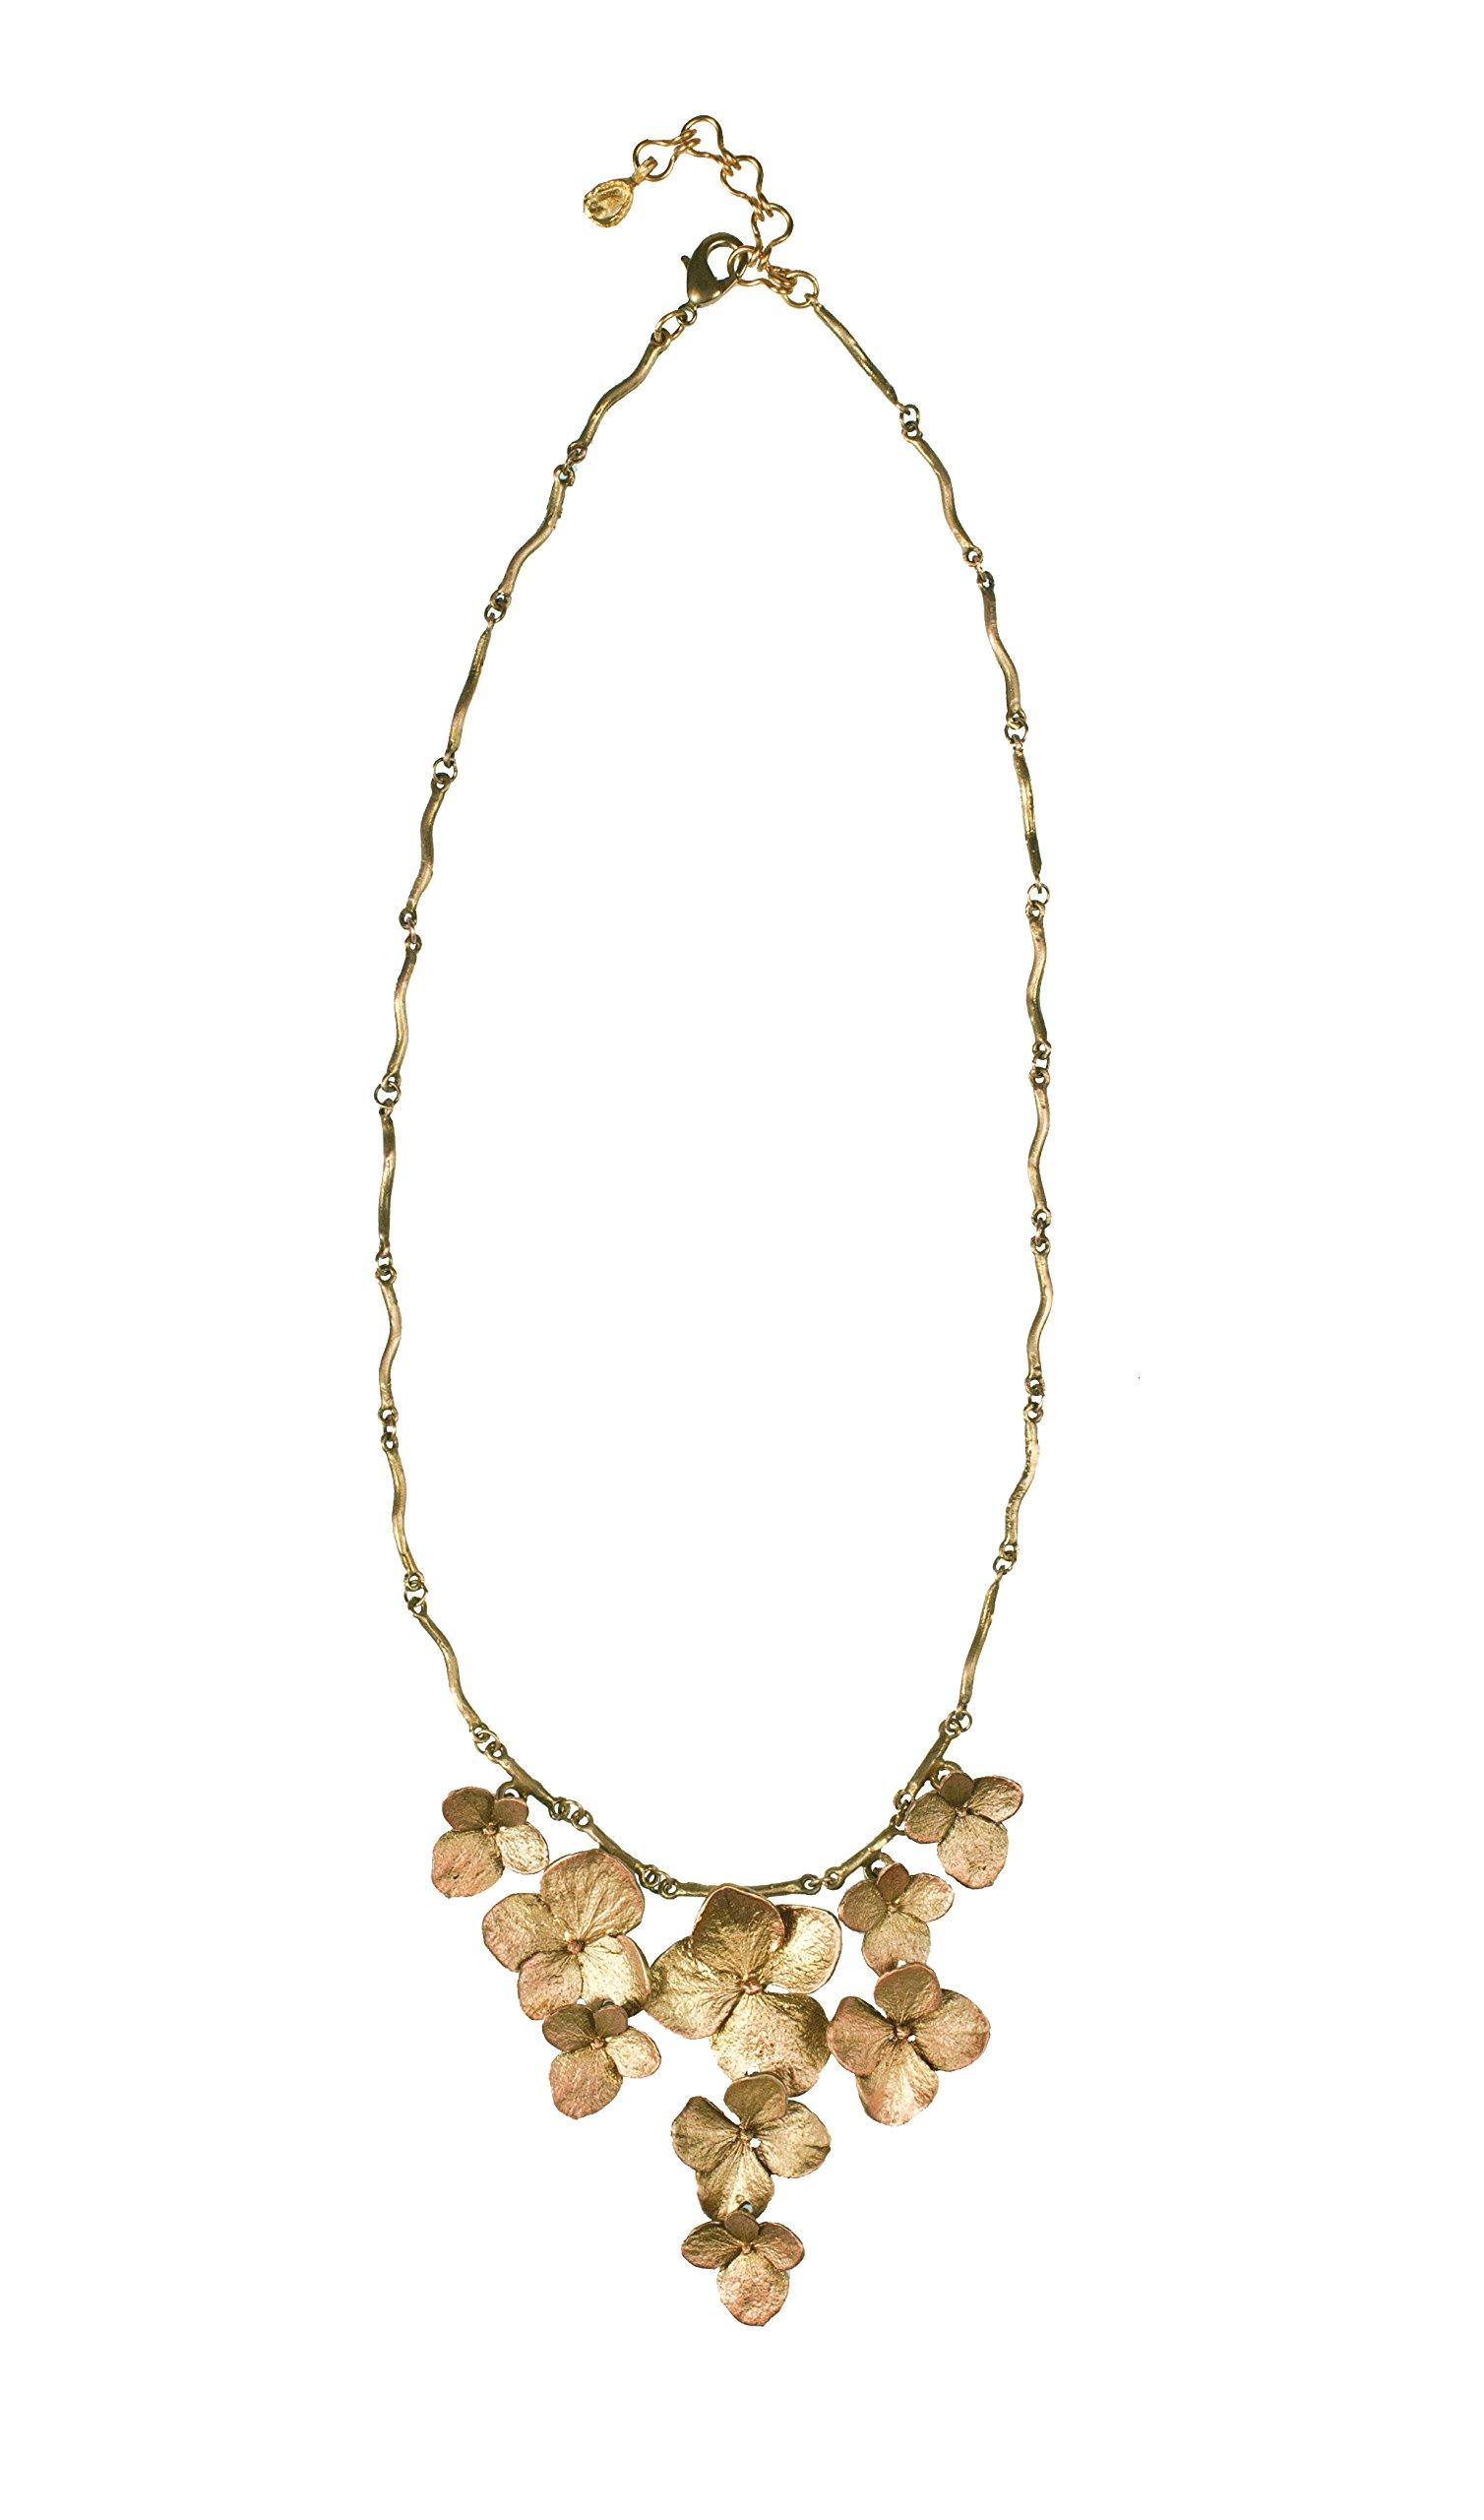 ''Hydrangea'' Contour Necklace by Michael Michaud for Silver Seasons